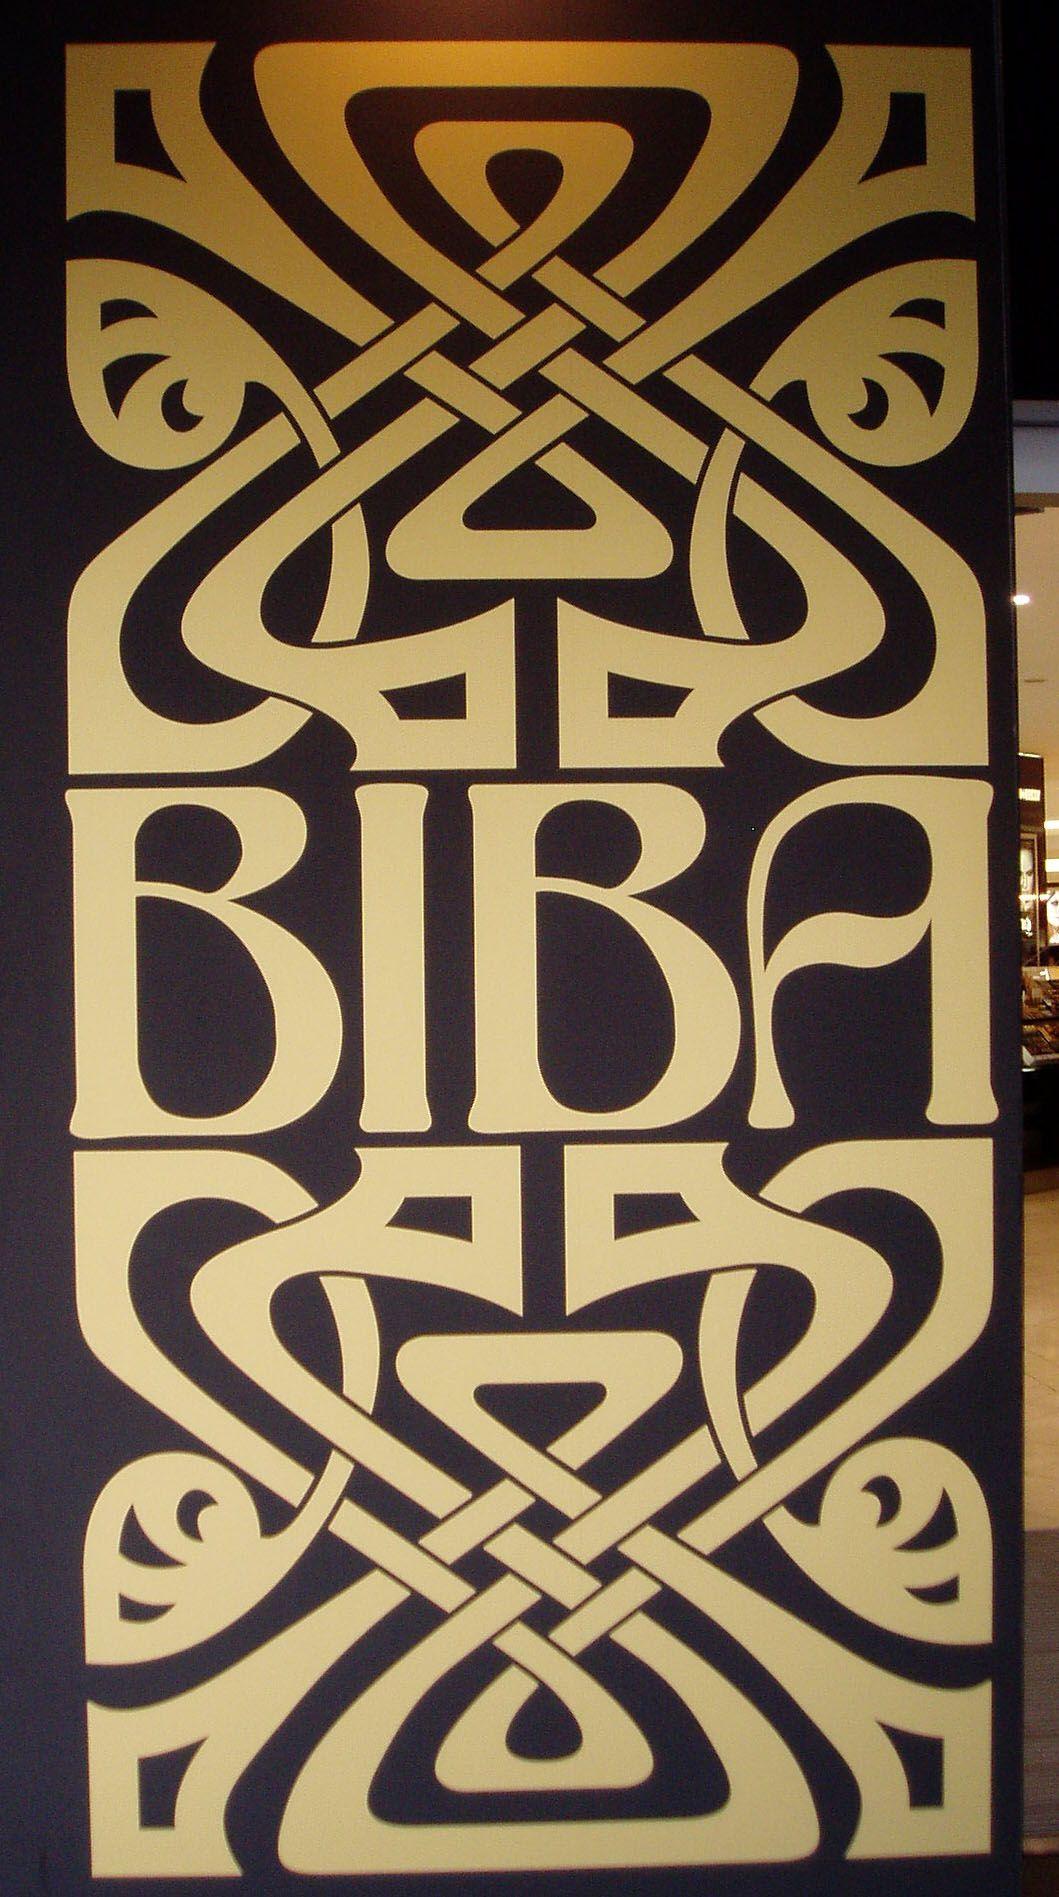 Love Biba Logo Find Shades Of Black & Gold Bit Harsh Favorite